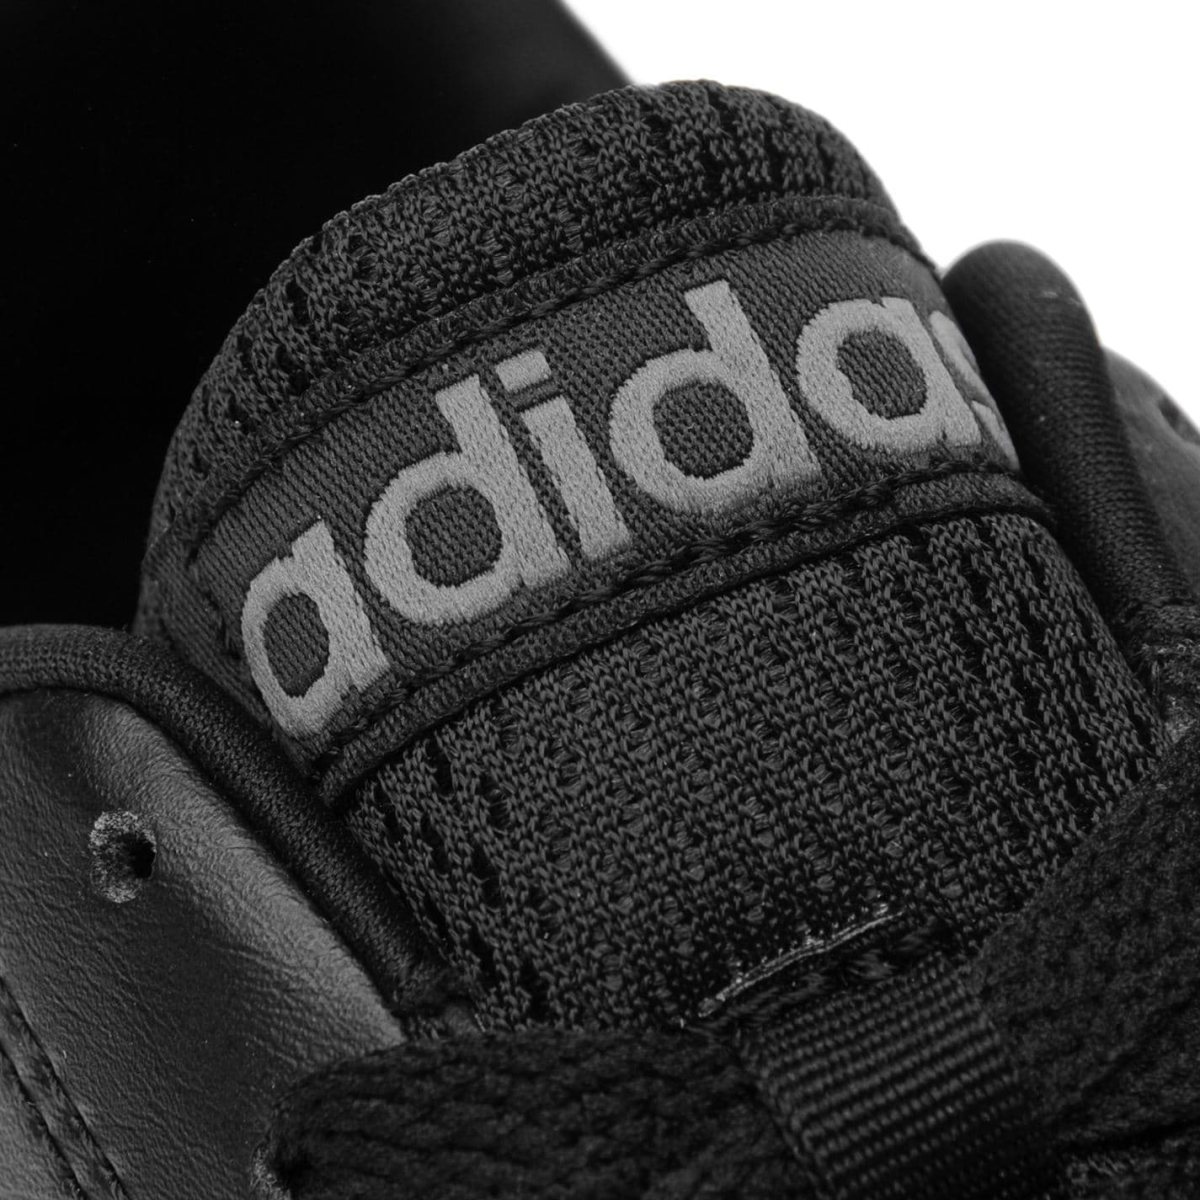 adidas-Advantage-Clean-Turnschuhe-Laufschuhe-Herren-Sneaker-Sportschuhe-3006 Indexbild 5